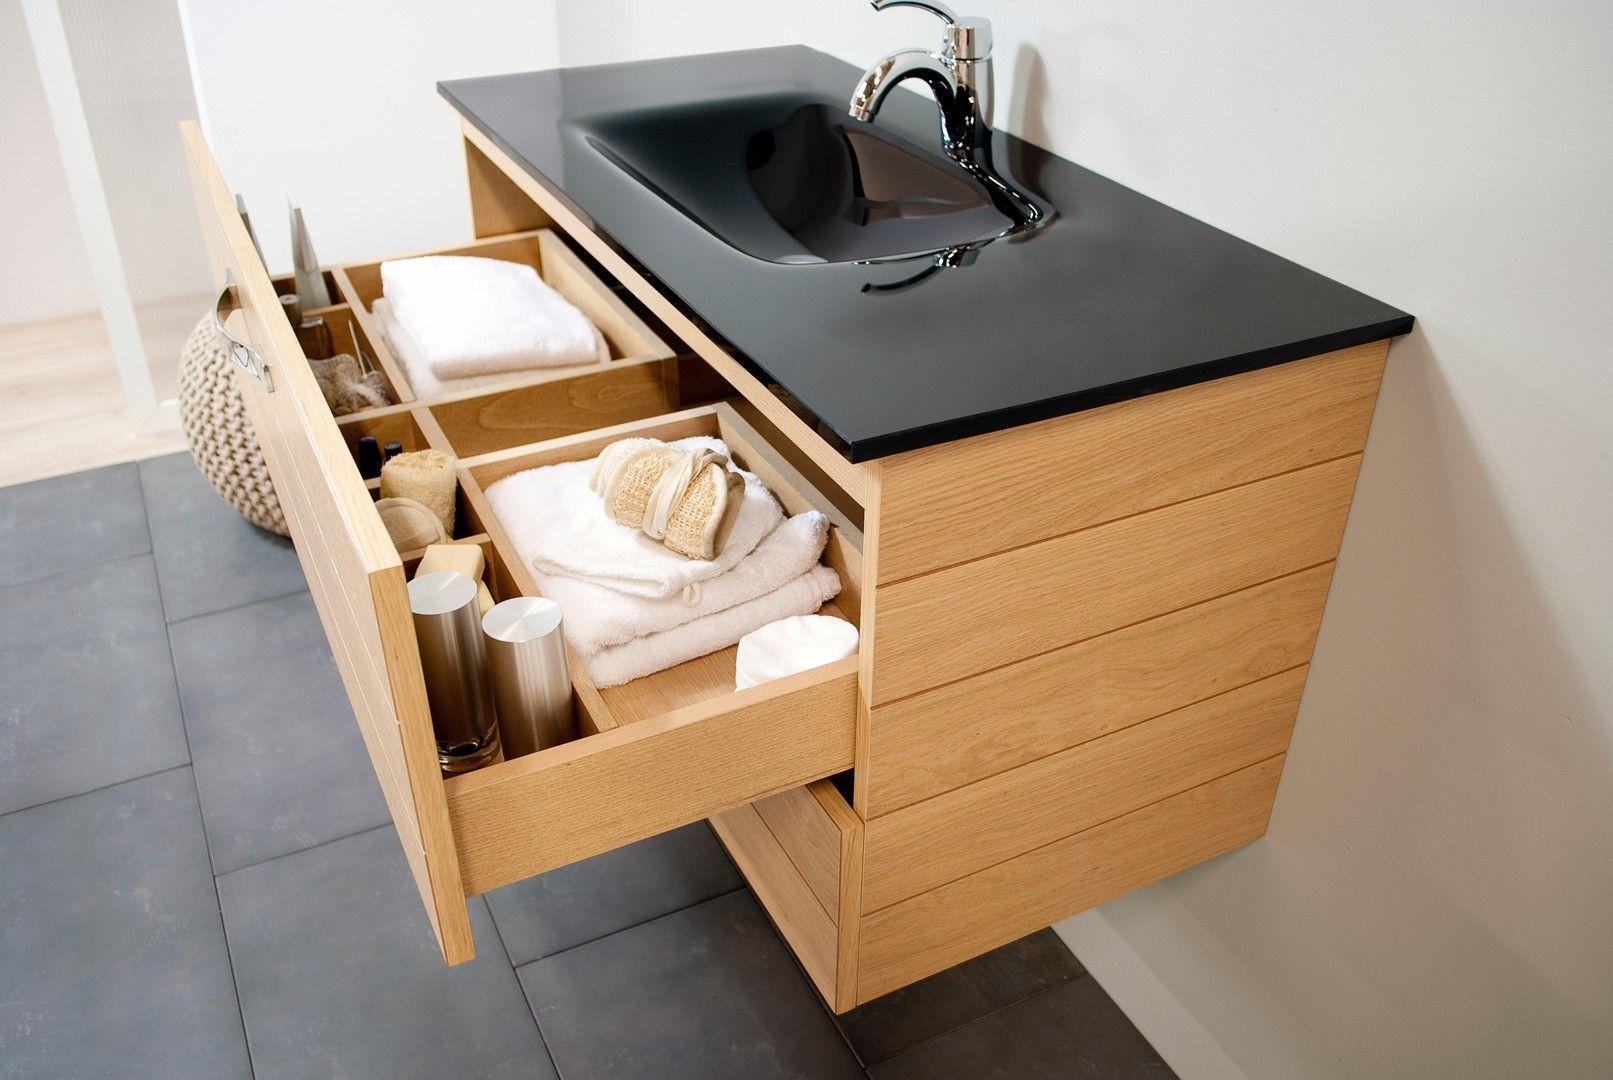 Meuble Et Vasque Salle De Bain : Indogate.com meuble salle de bain ...